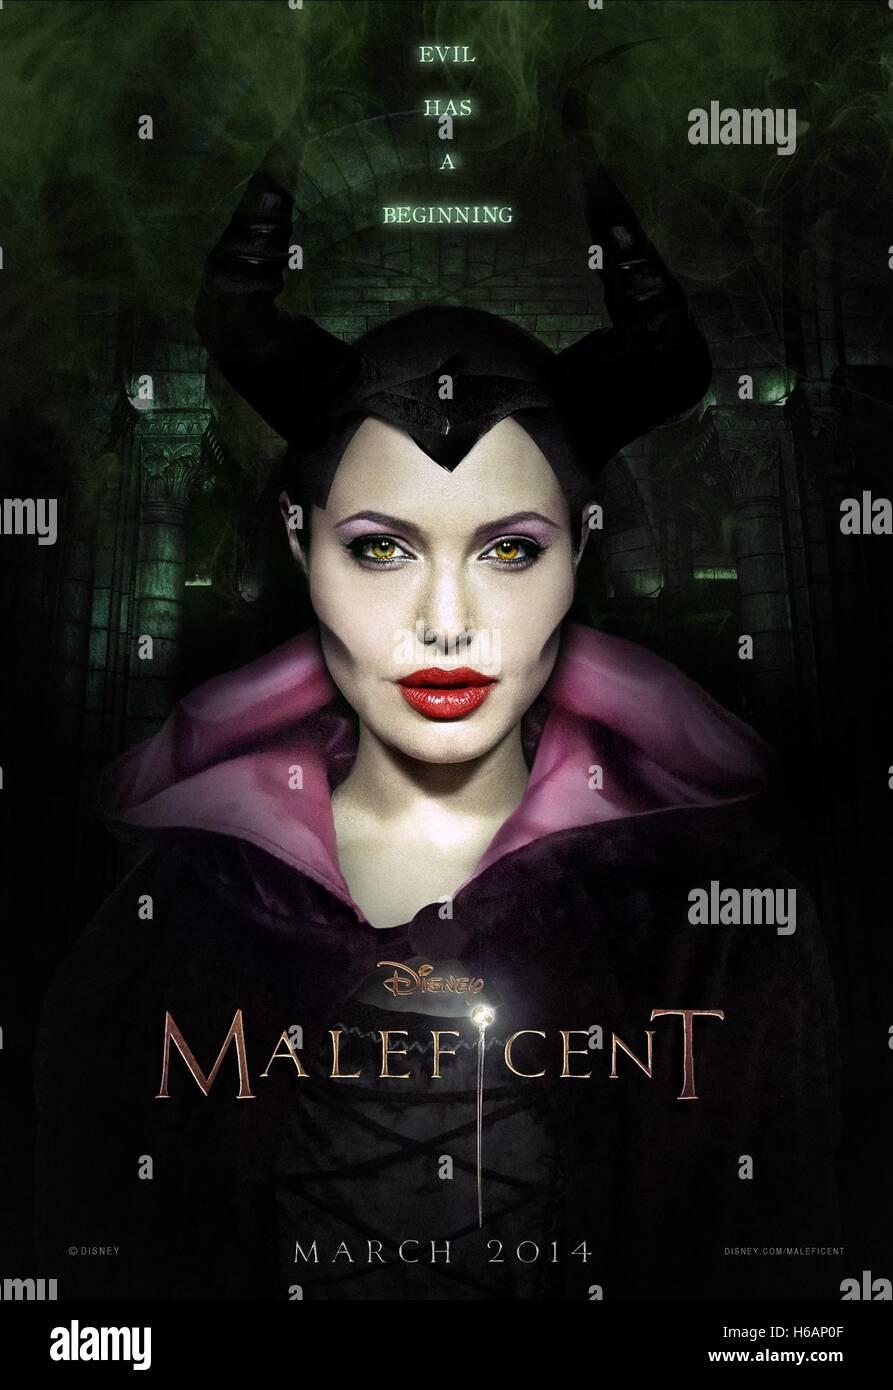 Angelina Jolie Poster Maleficent 2014 Stock Photo